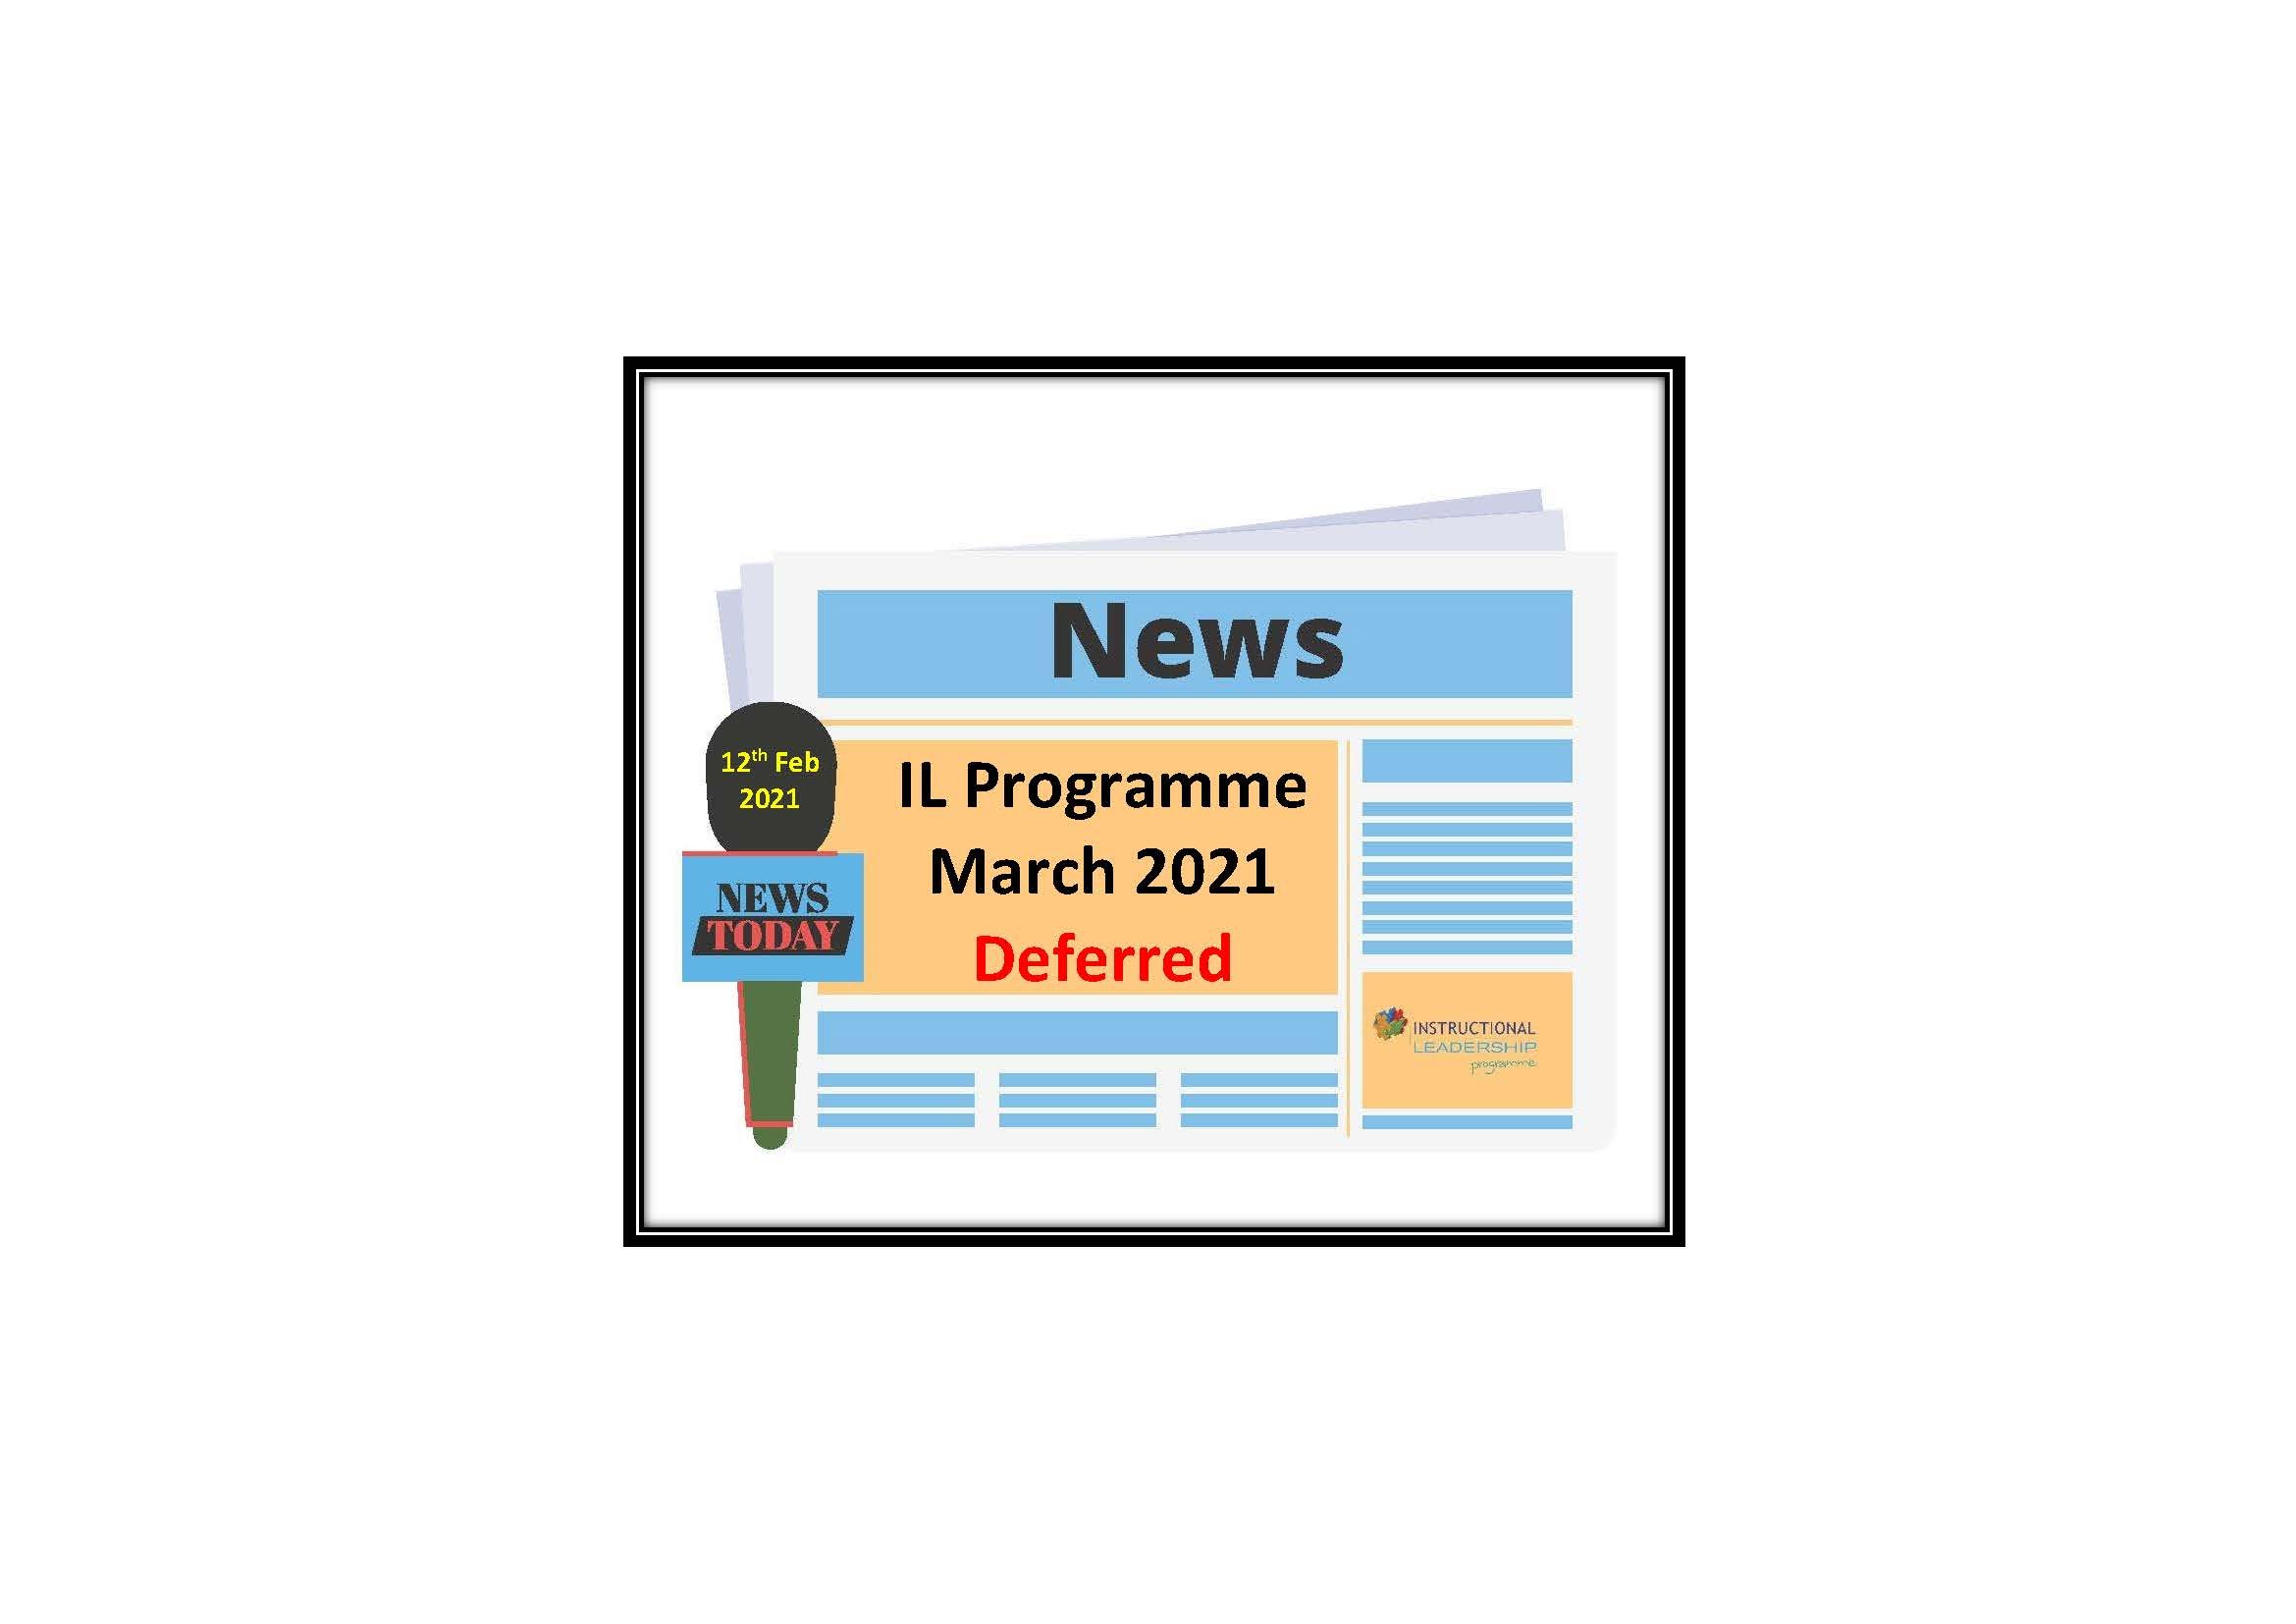 IL Programme – March 2021